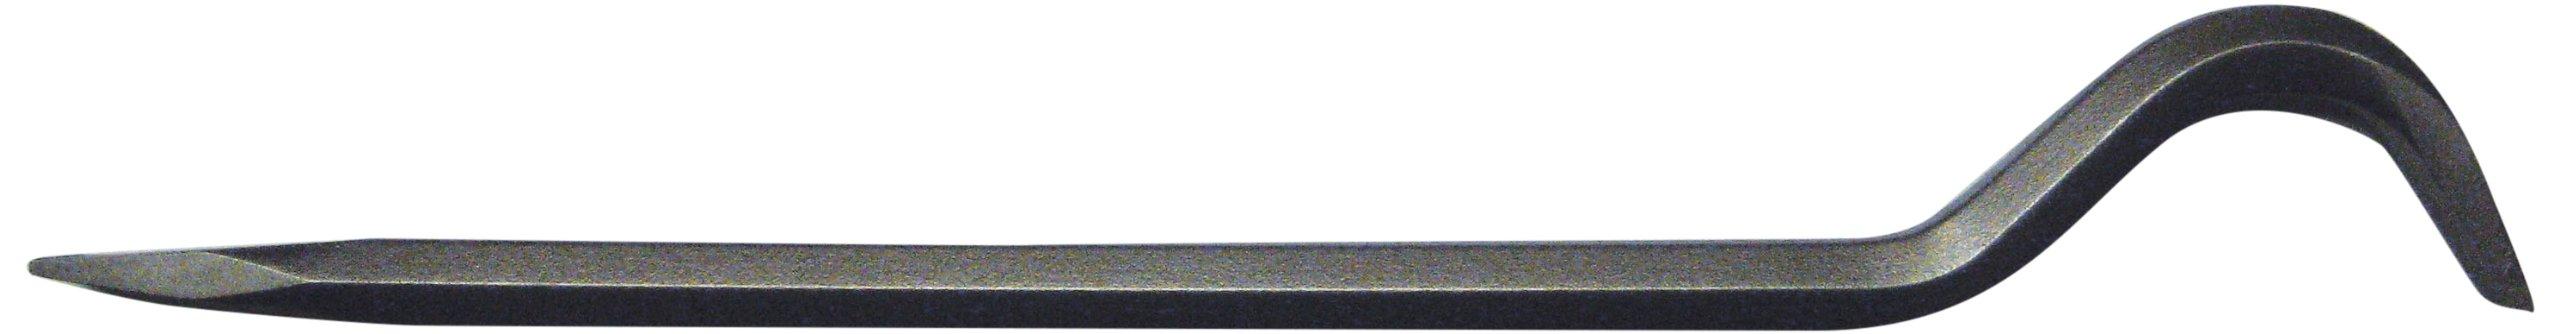 Wright Tool 9M41280 Die Separating Bar, 18''